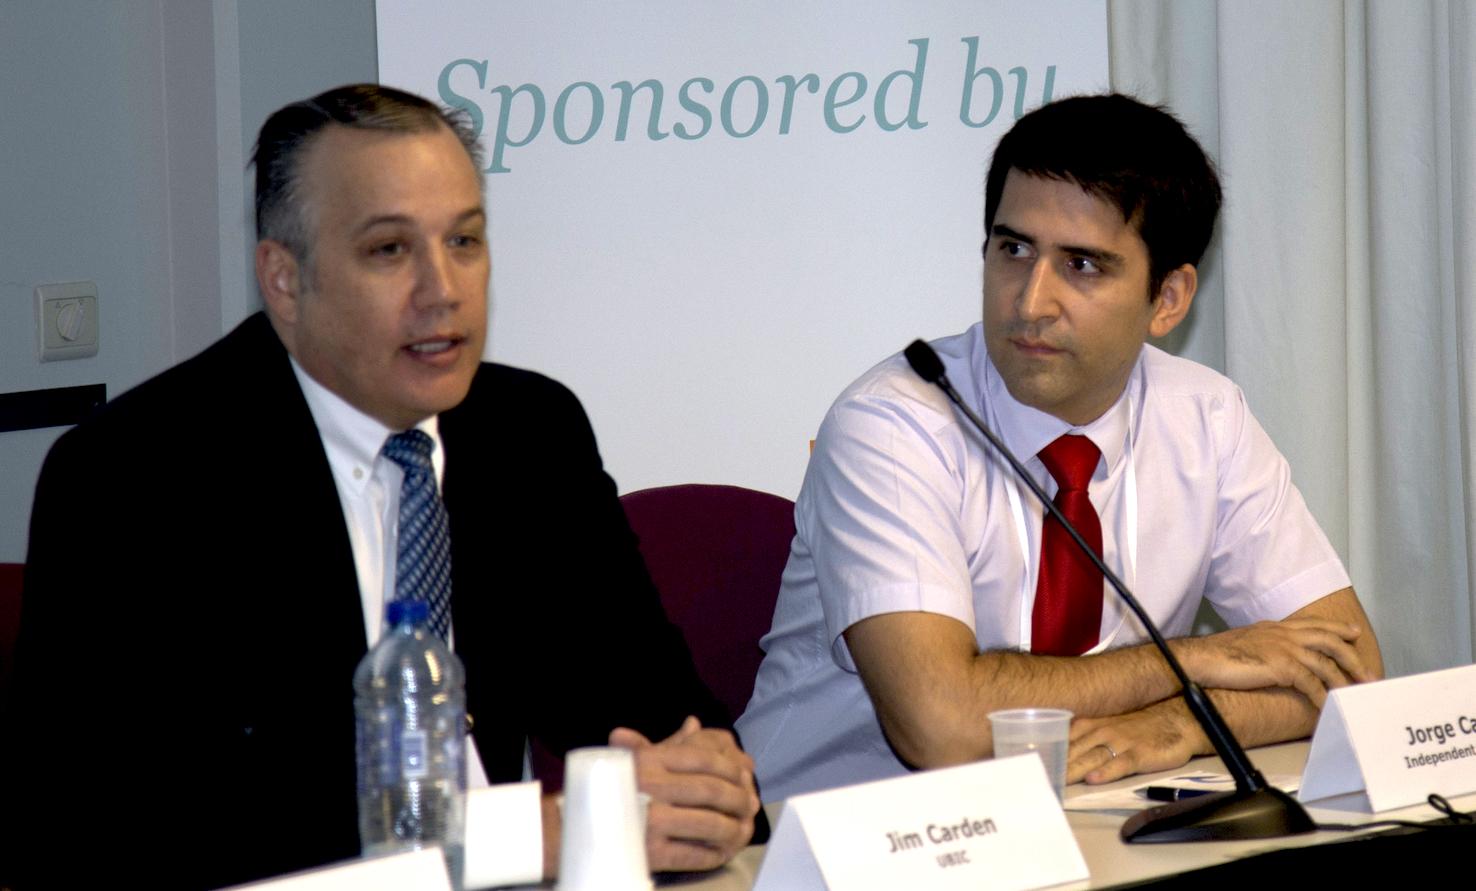 Prague College IT lecturer speaks at LawTech conference